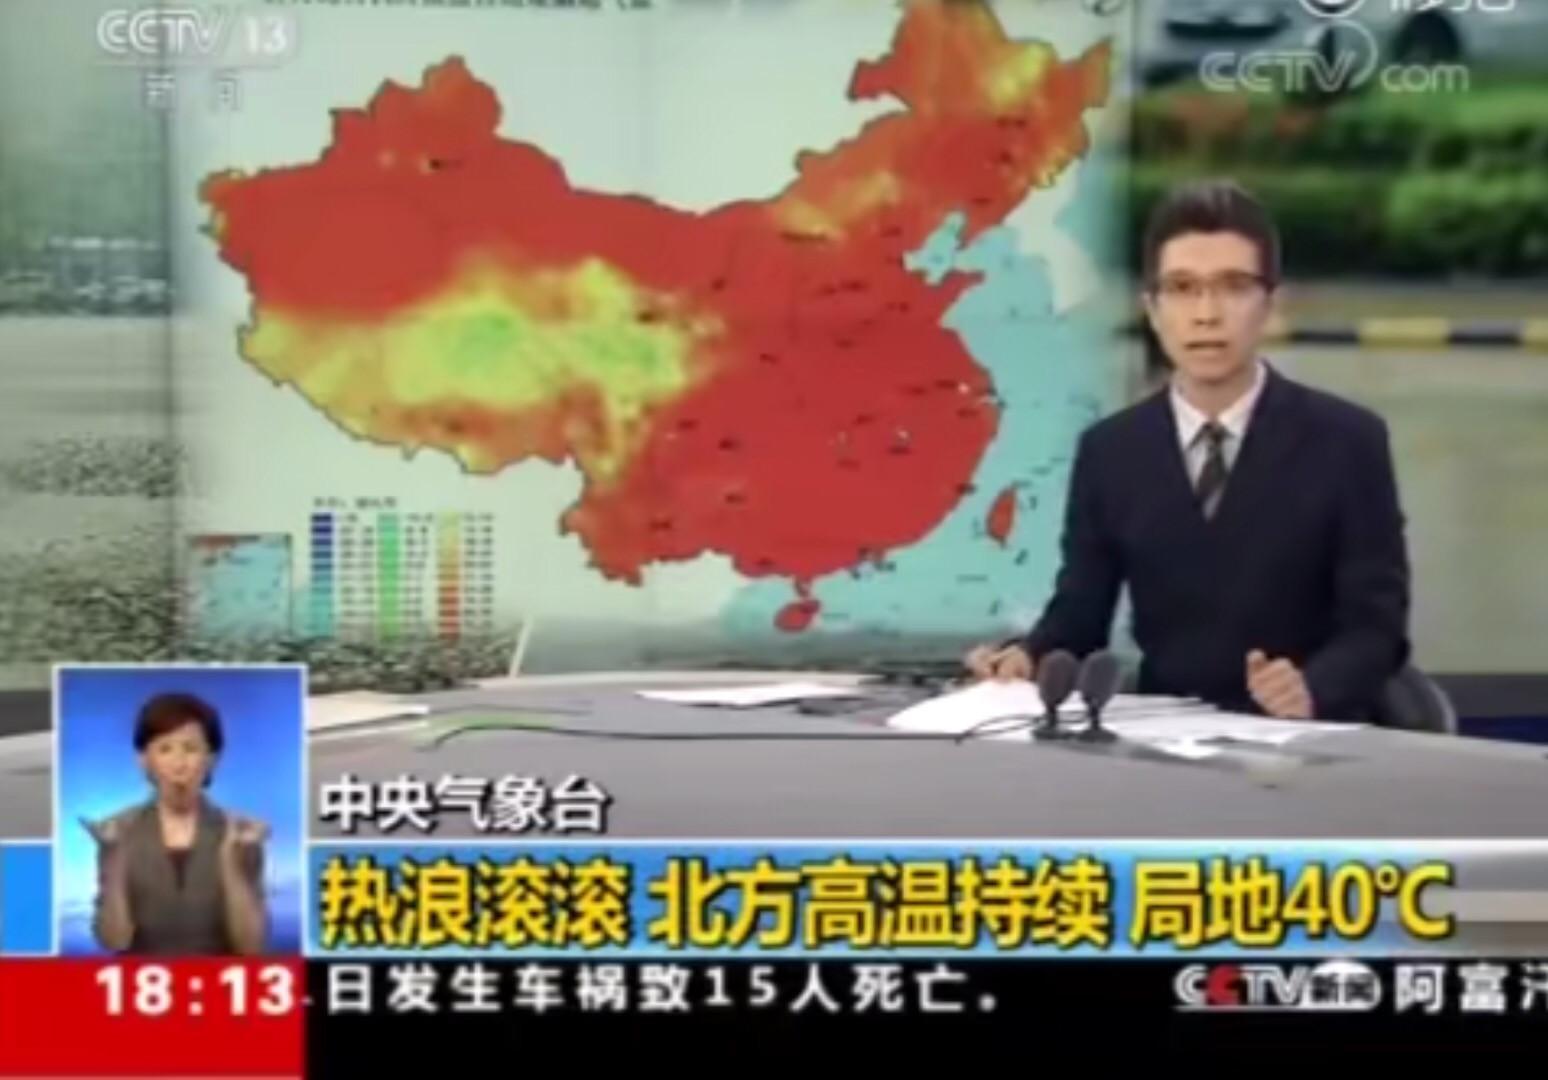 juhuasuan-China meteorological administration-2